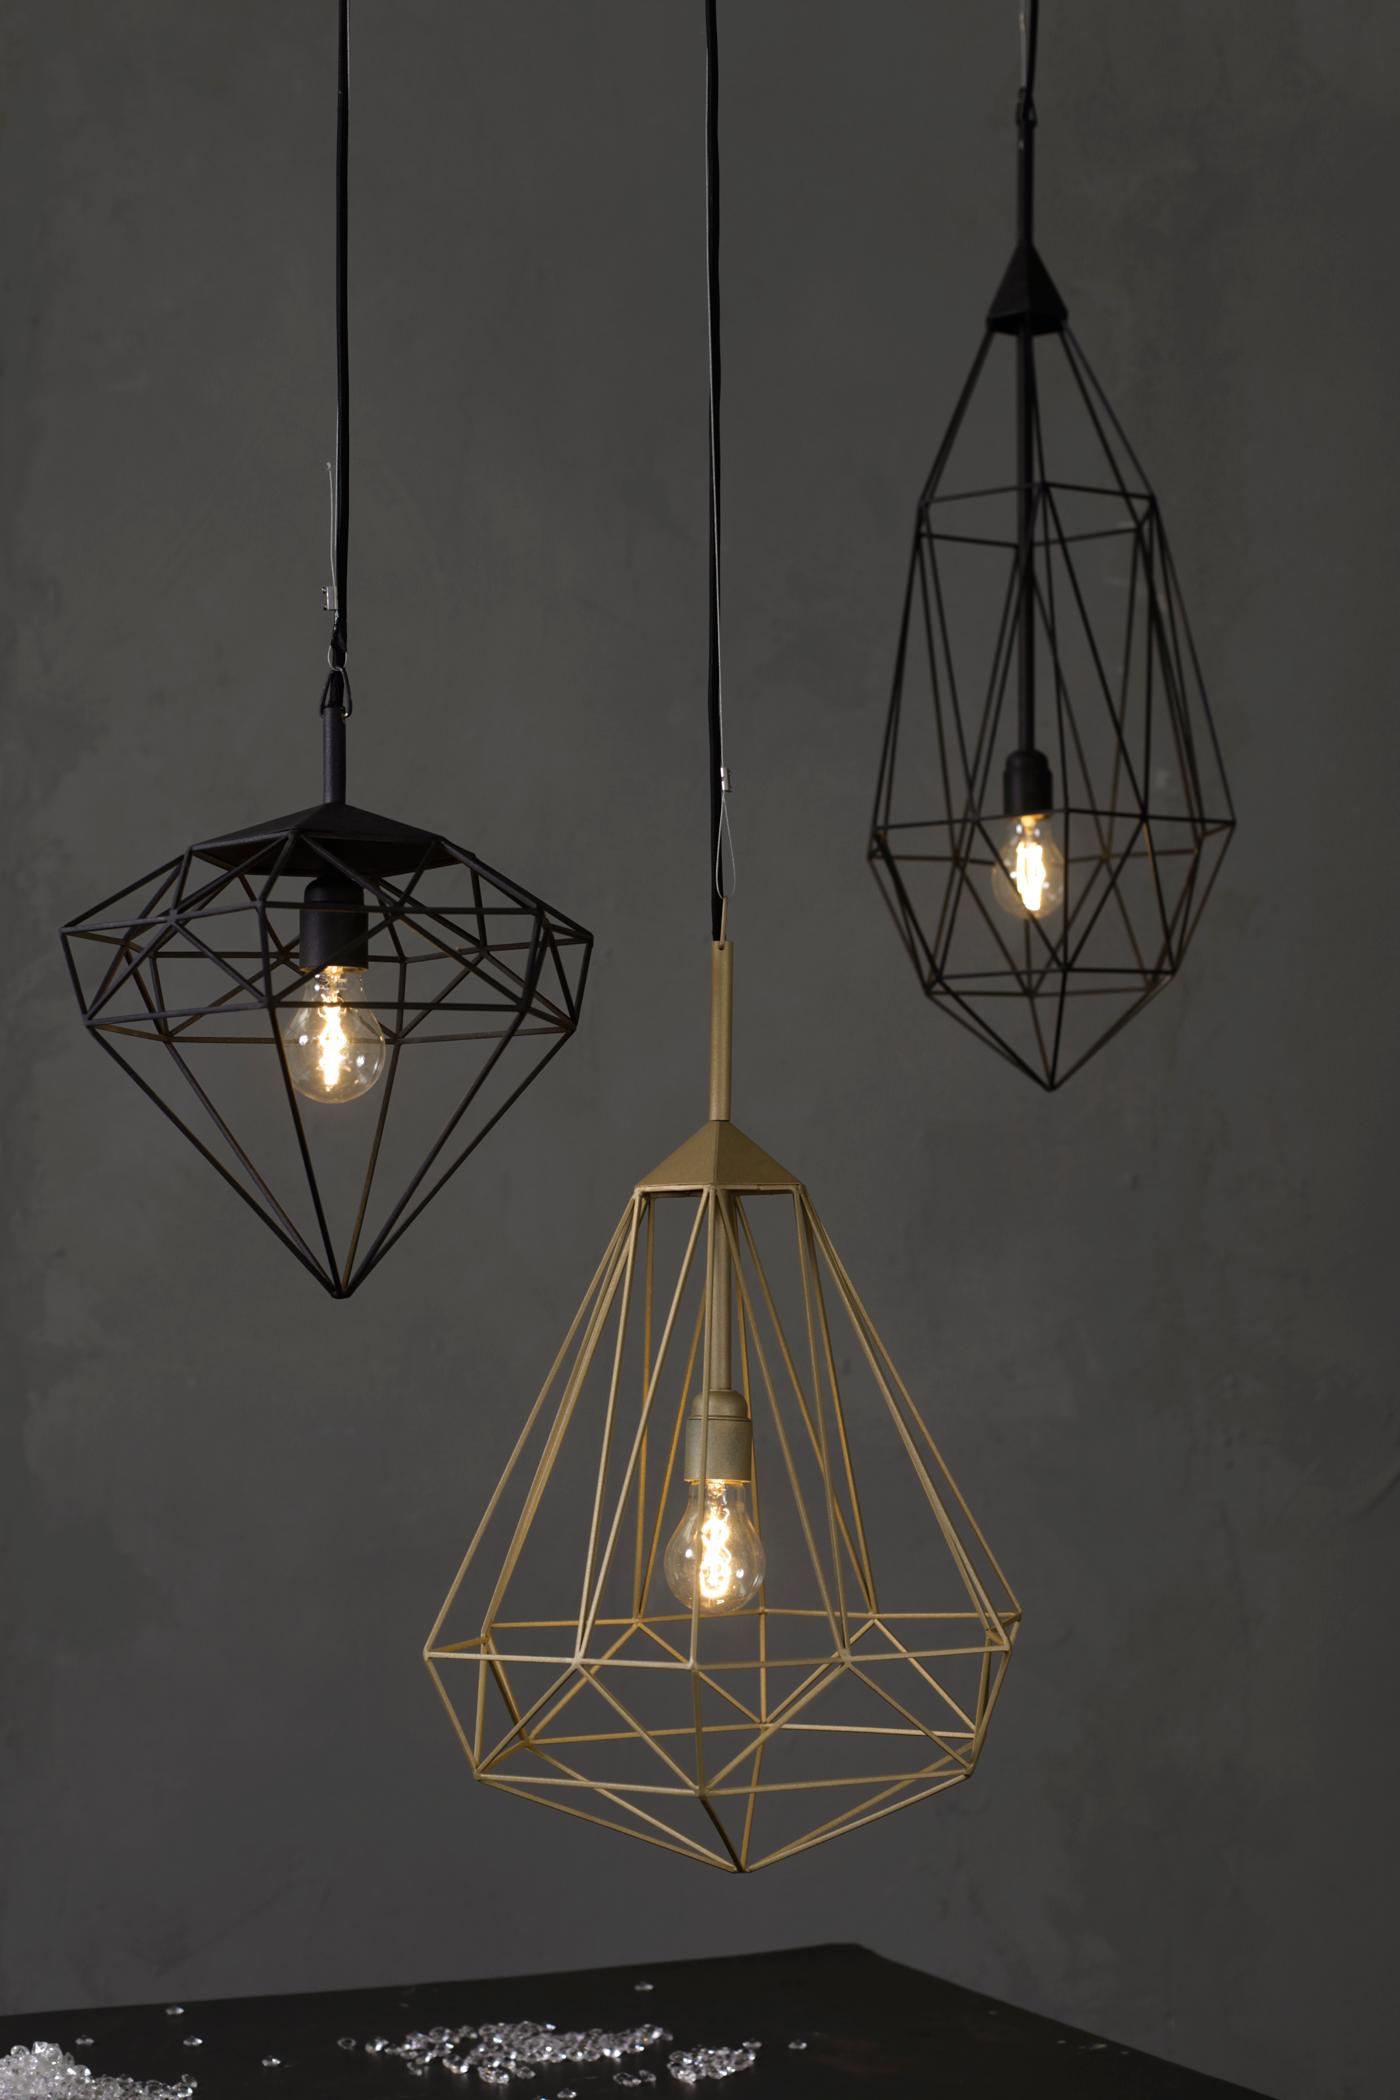 Diamond Industriele Hanglampen Van Jspr I Gimmii Shop Dutch Design